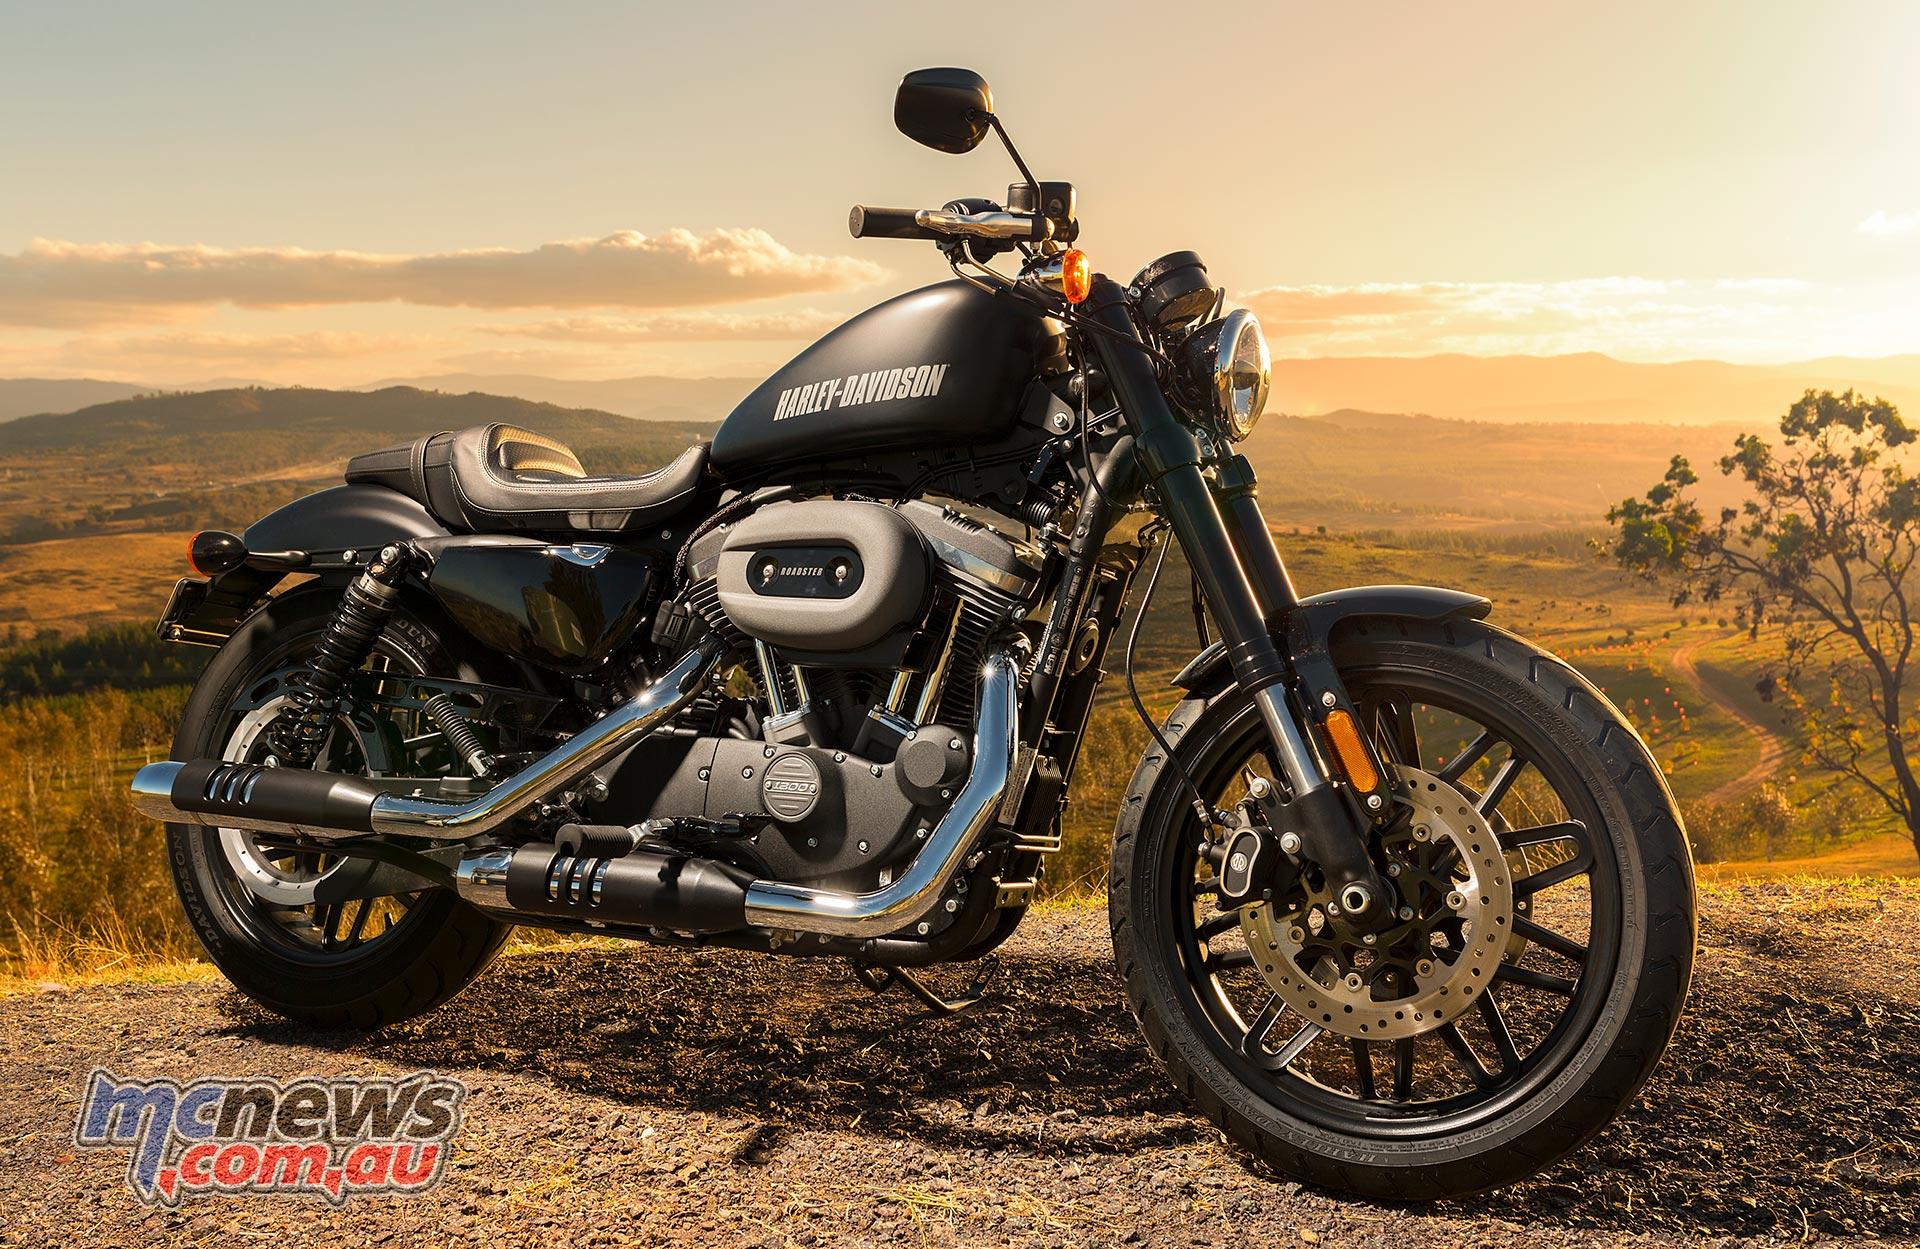 Harley Davidson: Harley-Davidson Roadster Review